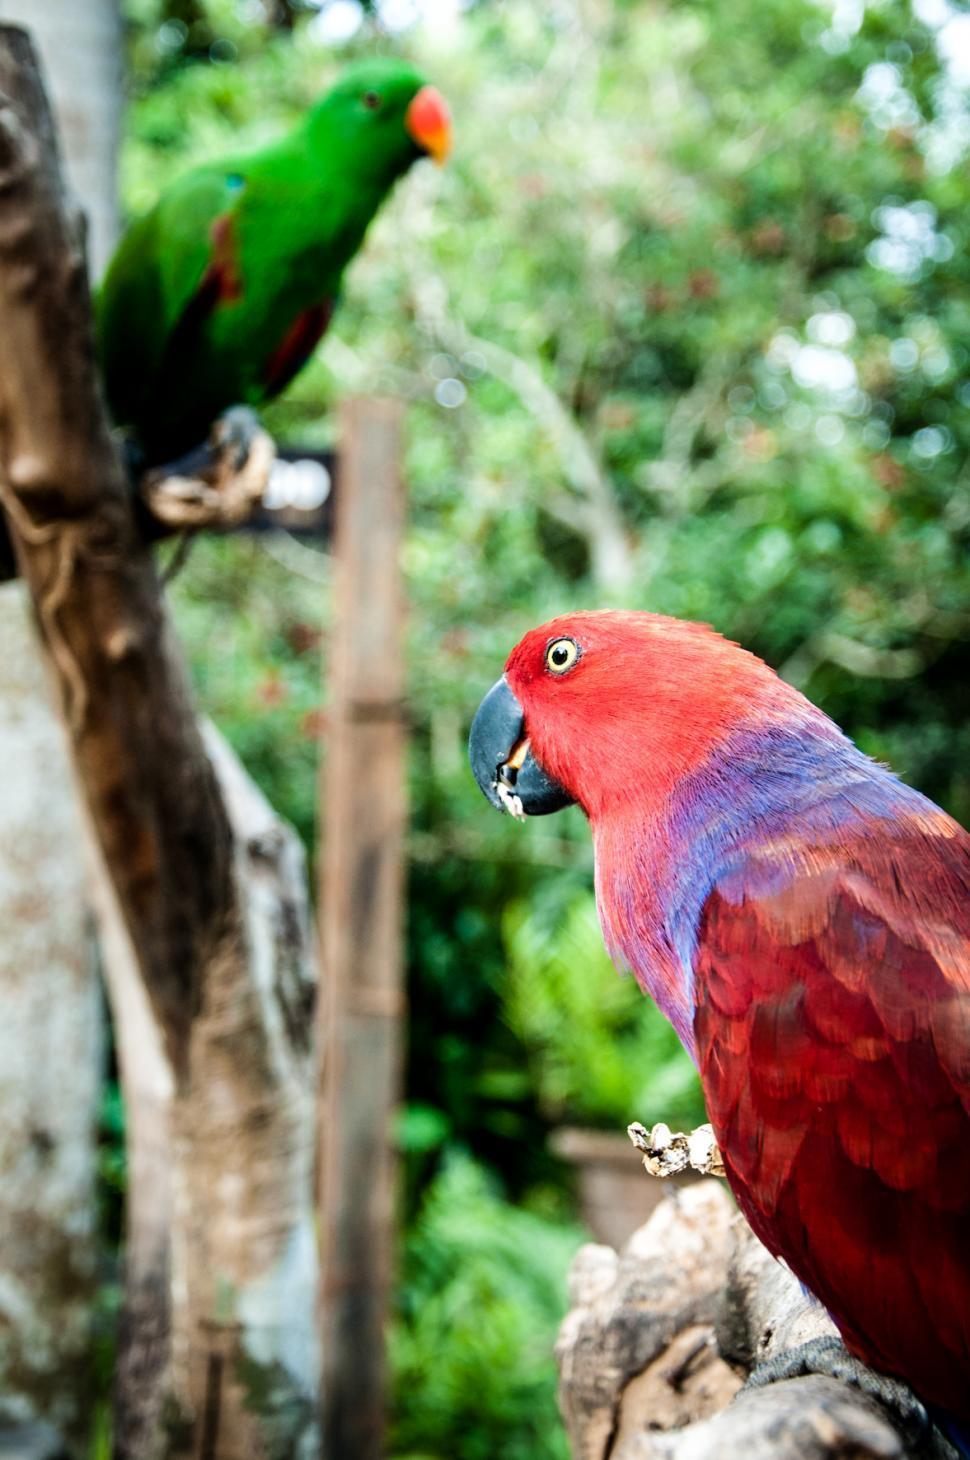 Download Free Stock HD Photo of parrot bird Online